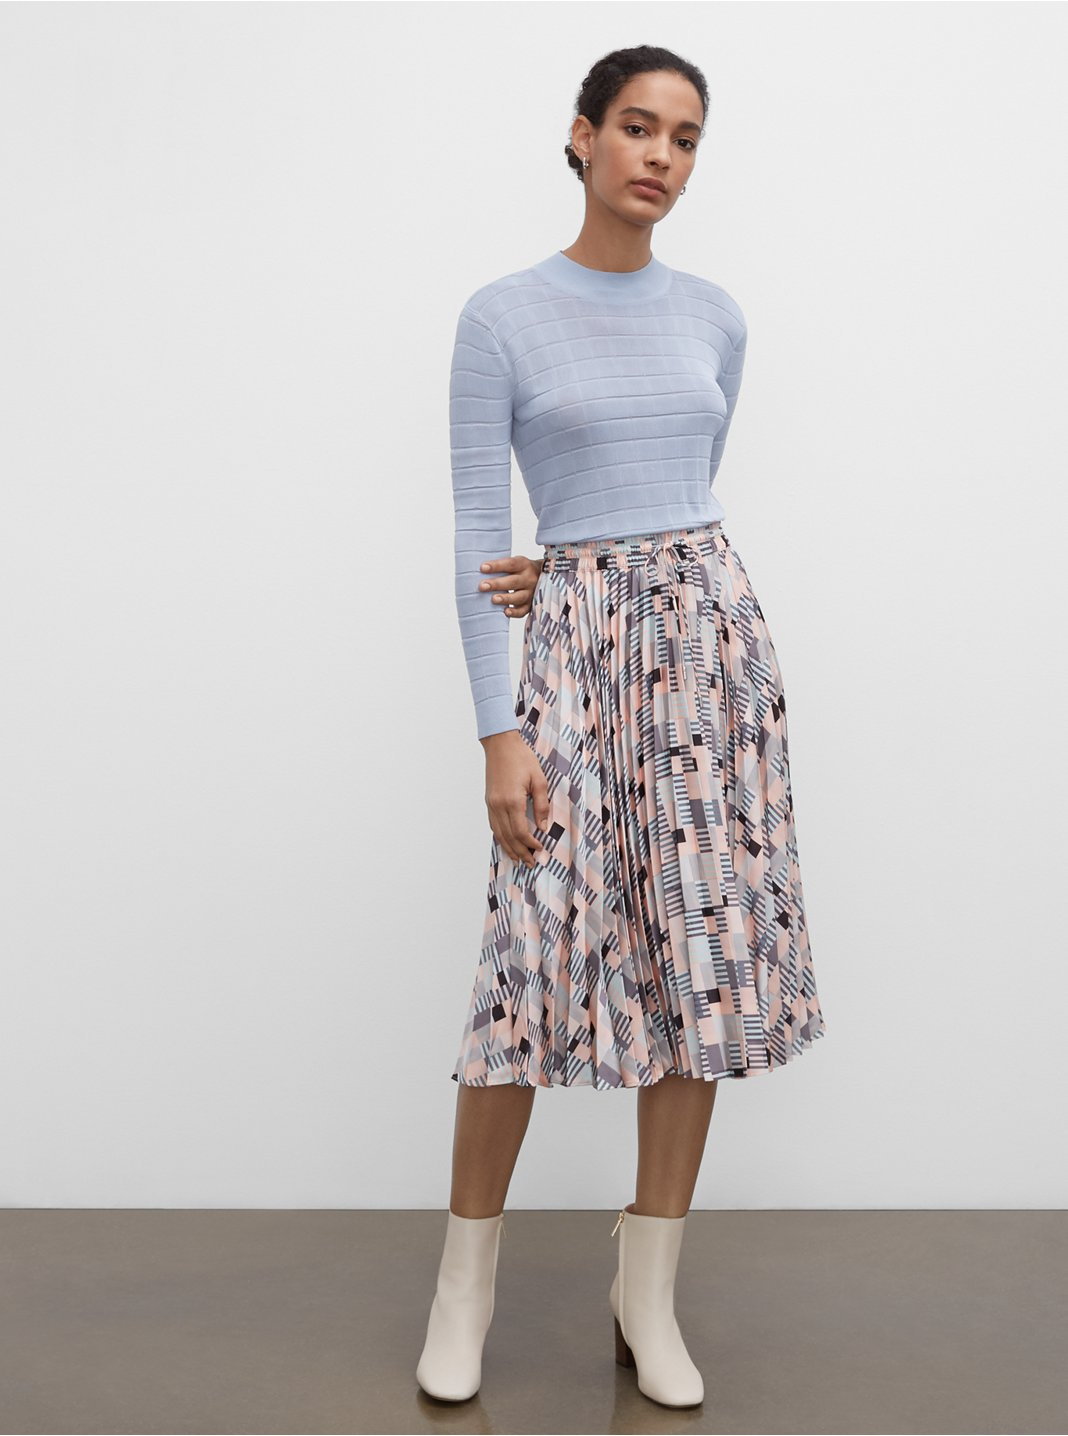 Geo Printed Pleated Skirt